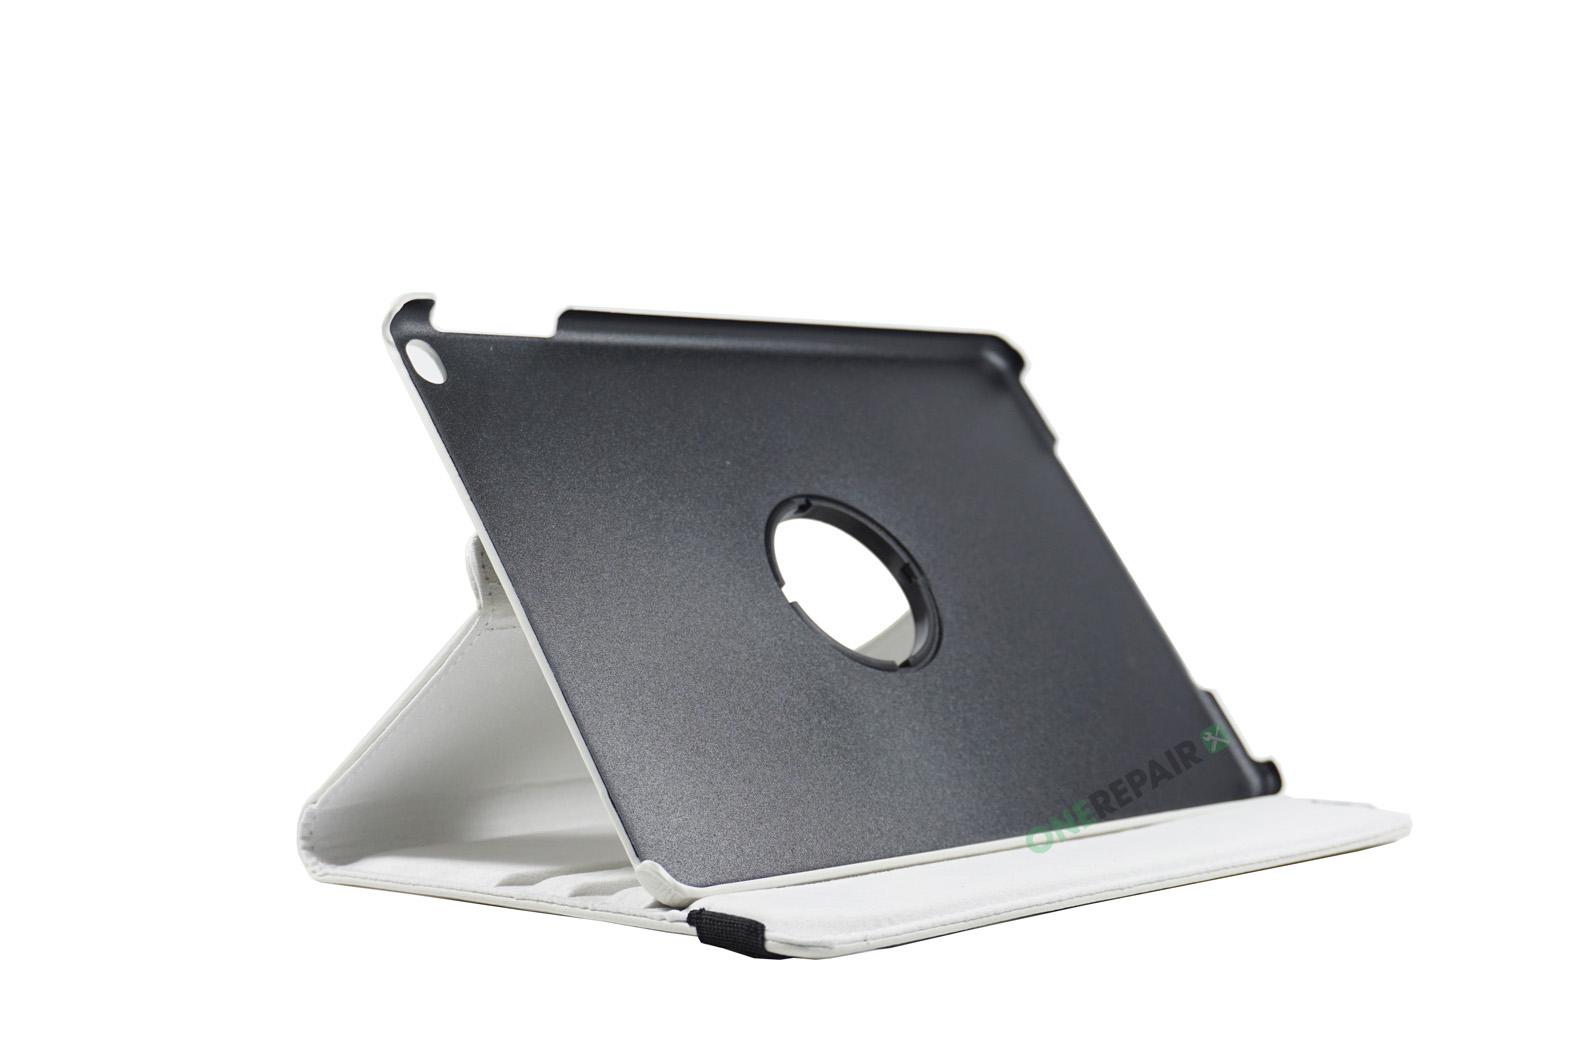 351055_iPad_Air2_2_A1566_A1567_Flipcover_Cover_Hvid_OneRepair_00006